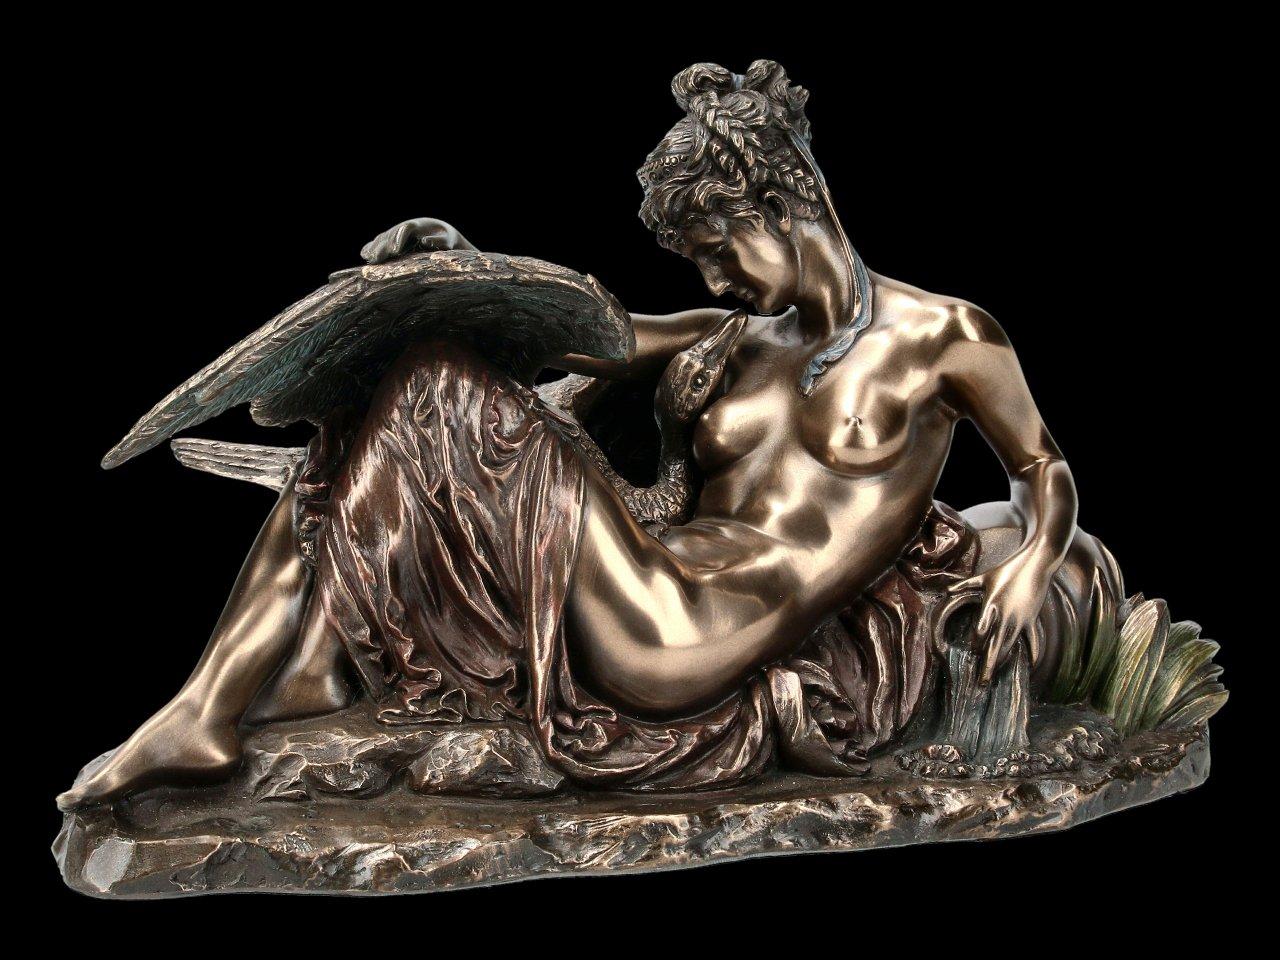 Leda and the Swan Figurine